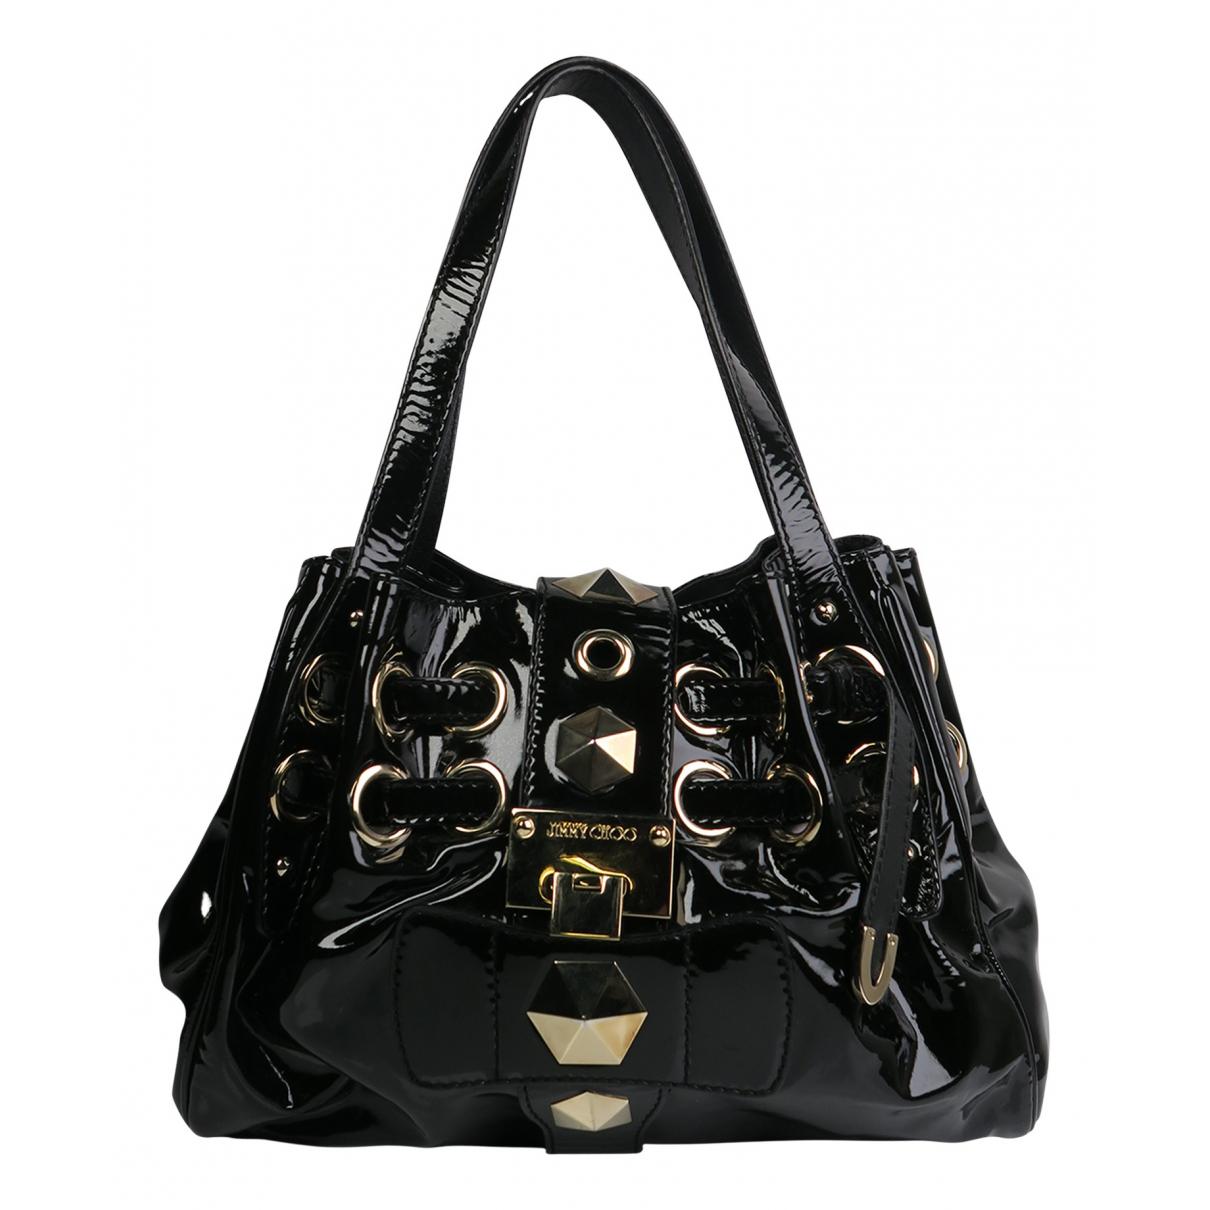 Jimmy Choo N Black Patent leather handbag for Women N